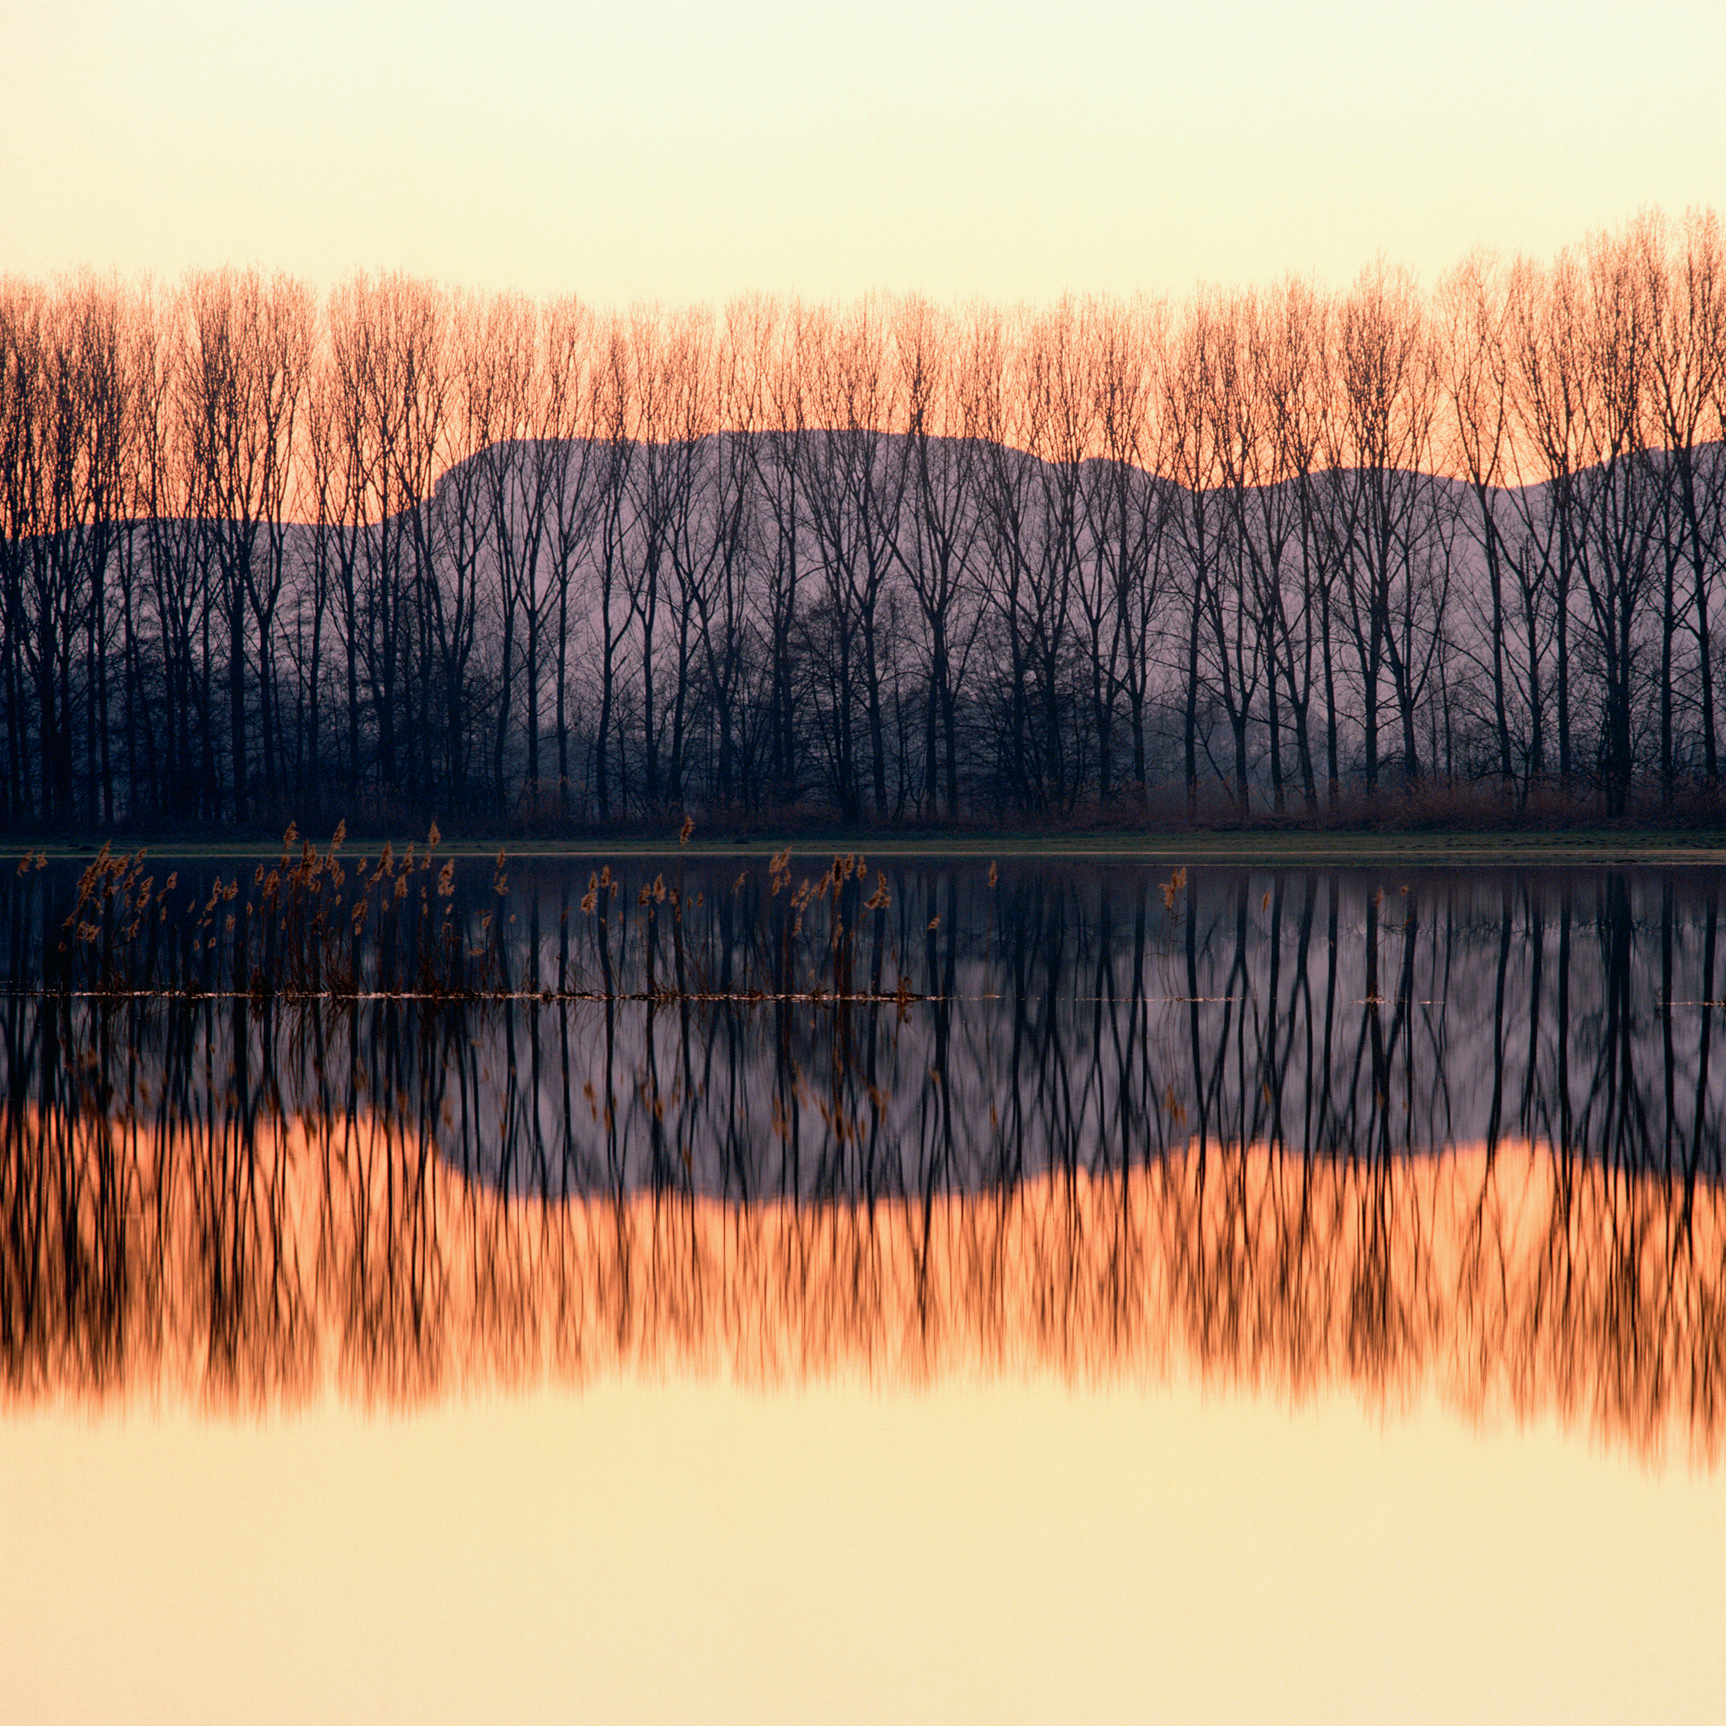 Selestat, Bas Rhin, France (020010)